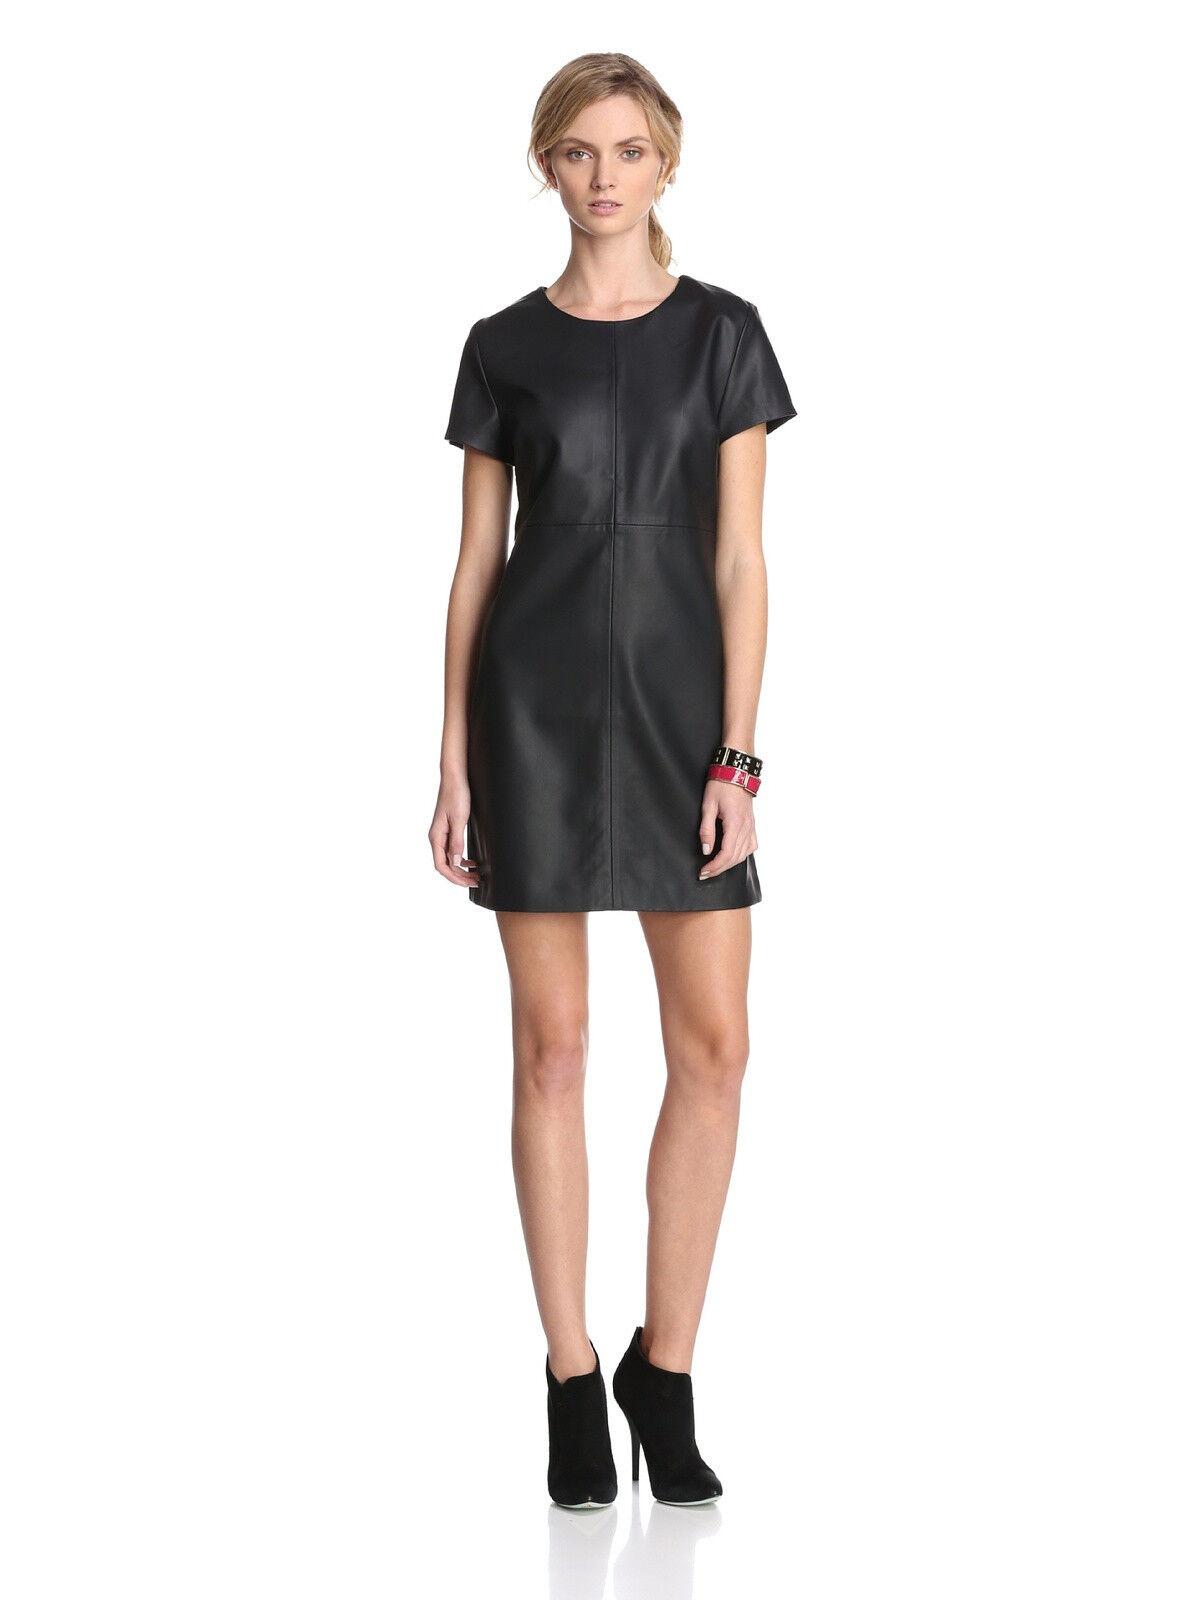 JAYE. E Woherren Faux Leather Dress  - Tag